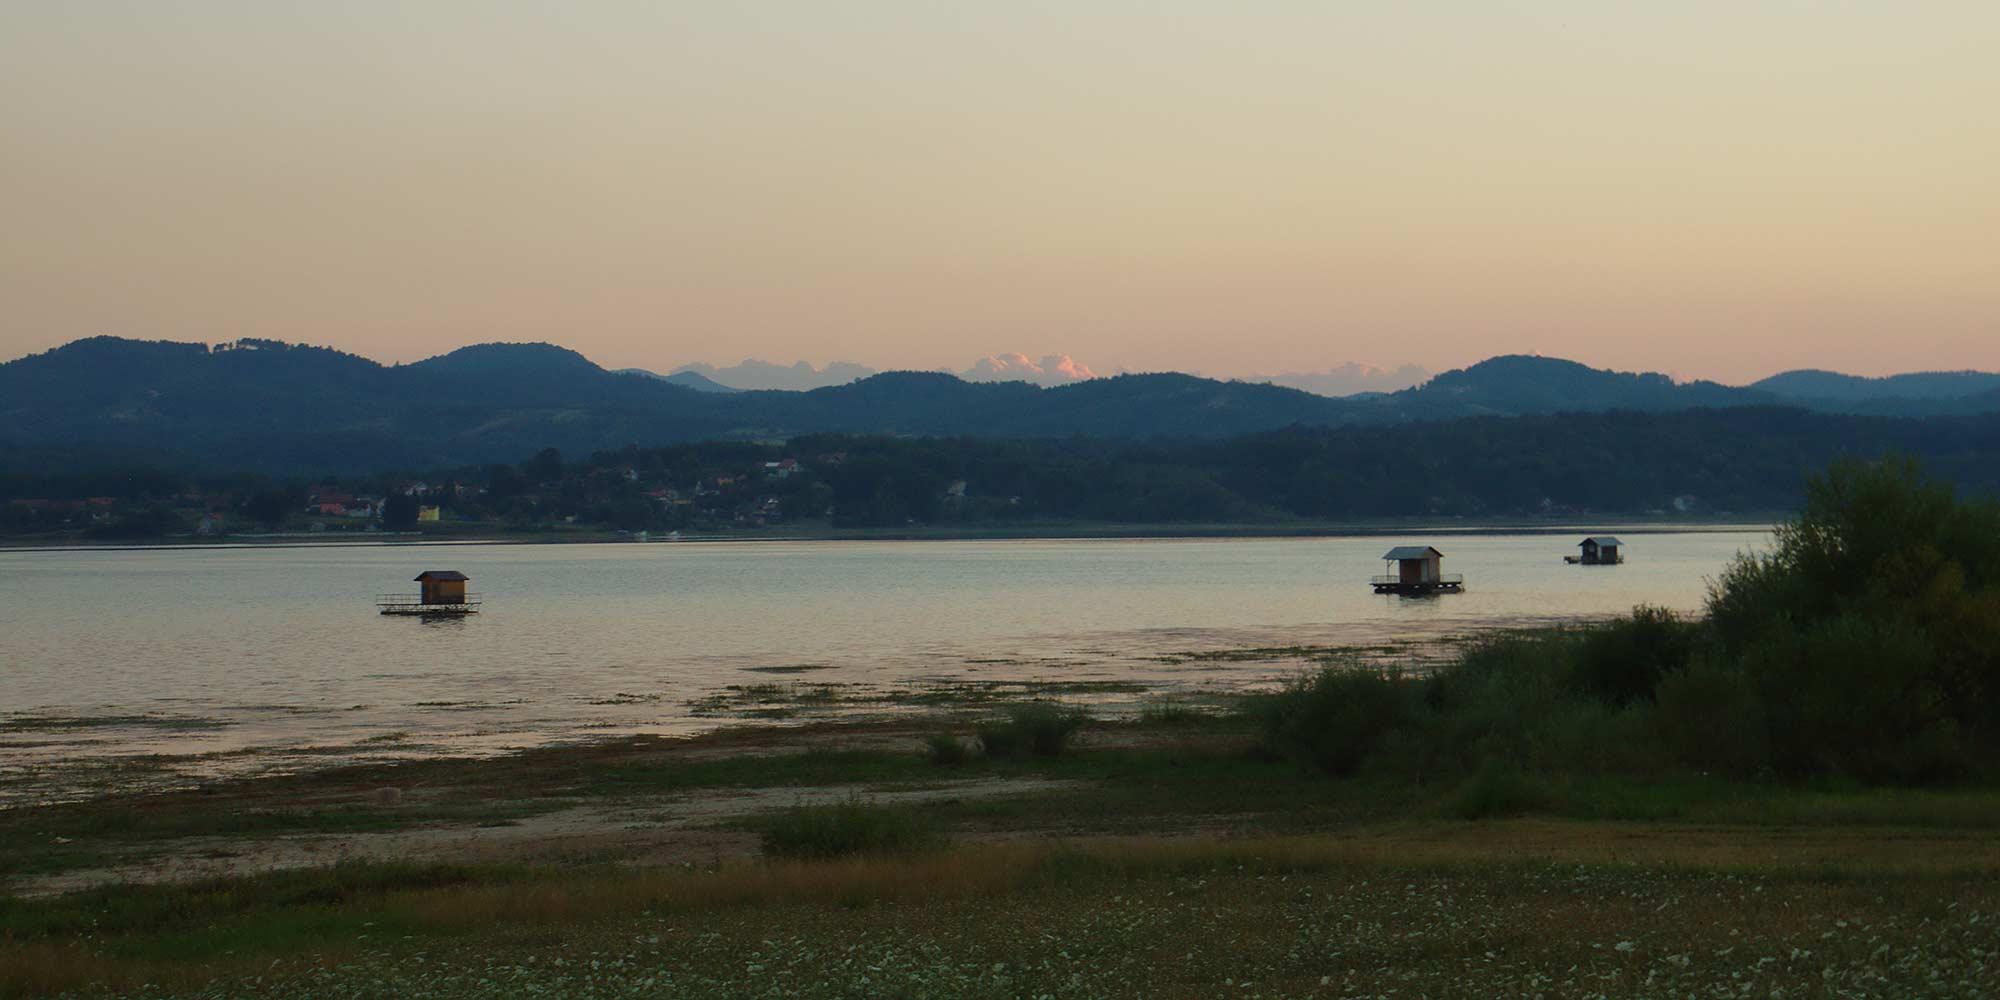 An evening view on Lake Modrac in Bosnia and Herzegovina